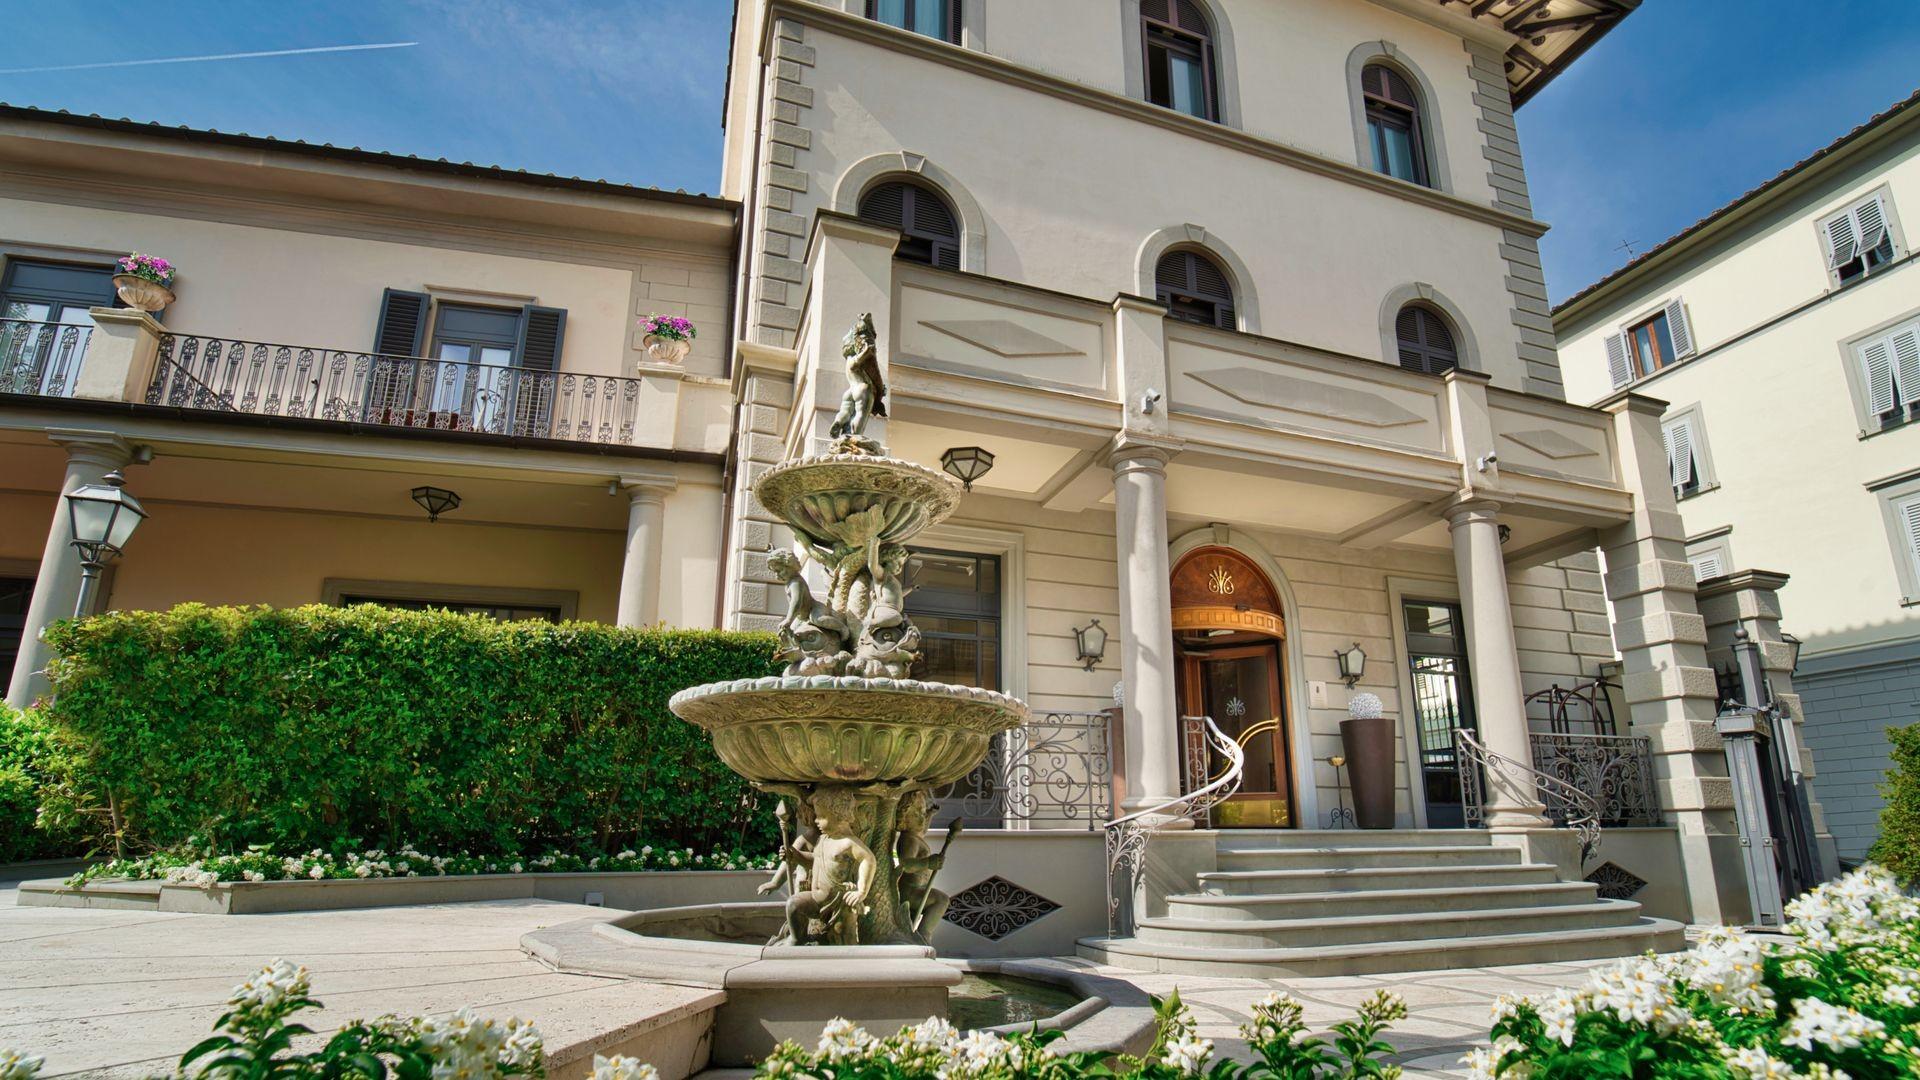 Montebello Splendid Hotel In Florence Italy New Hotel Montebello Splendid Florence Ficial Website Hotel